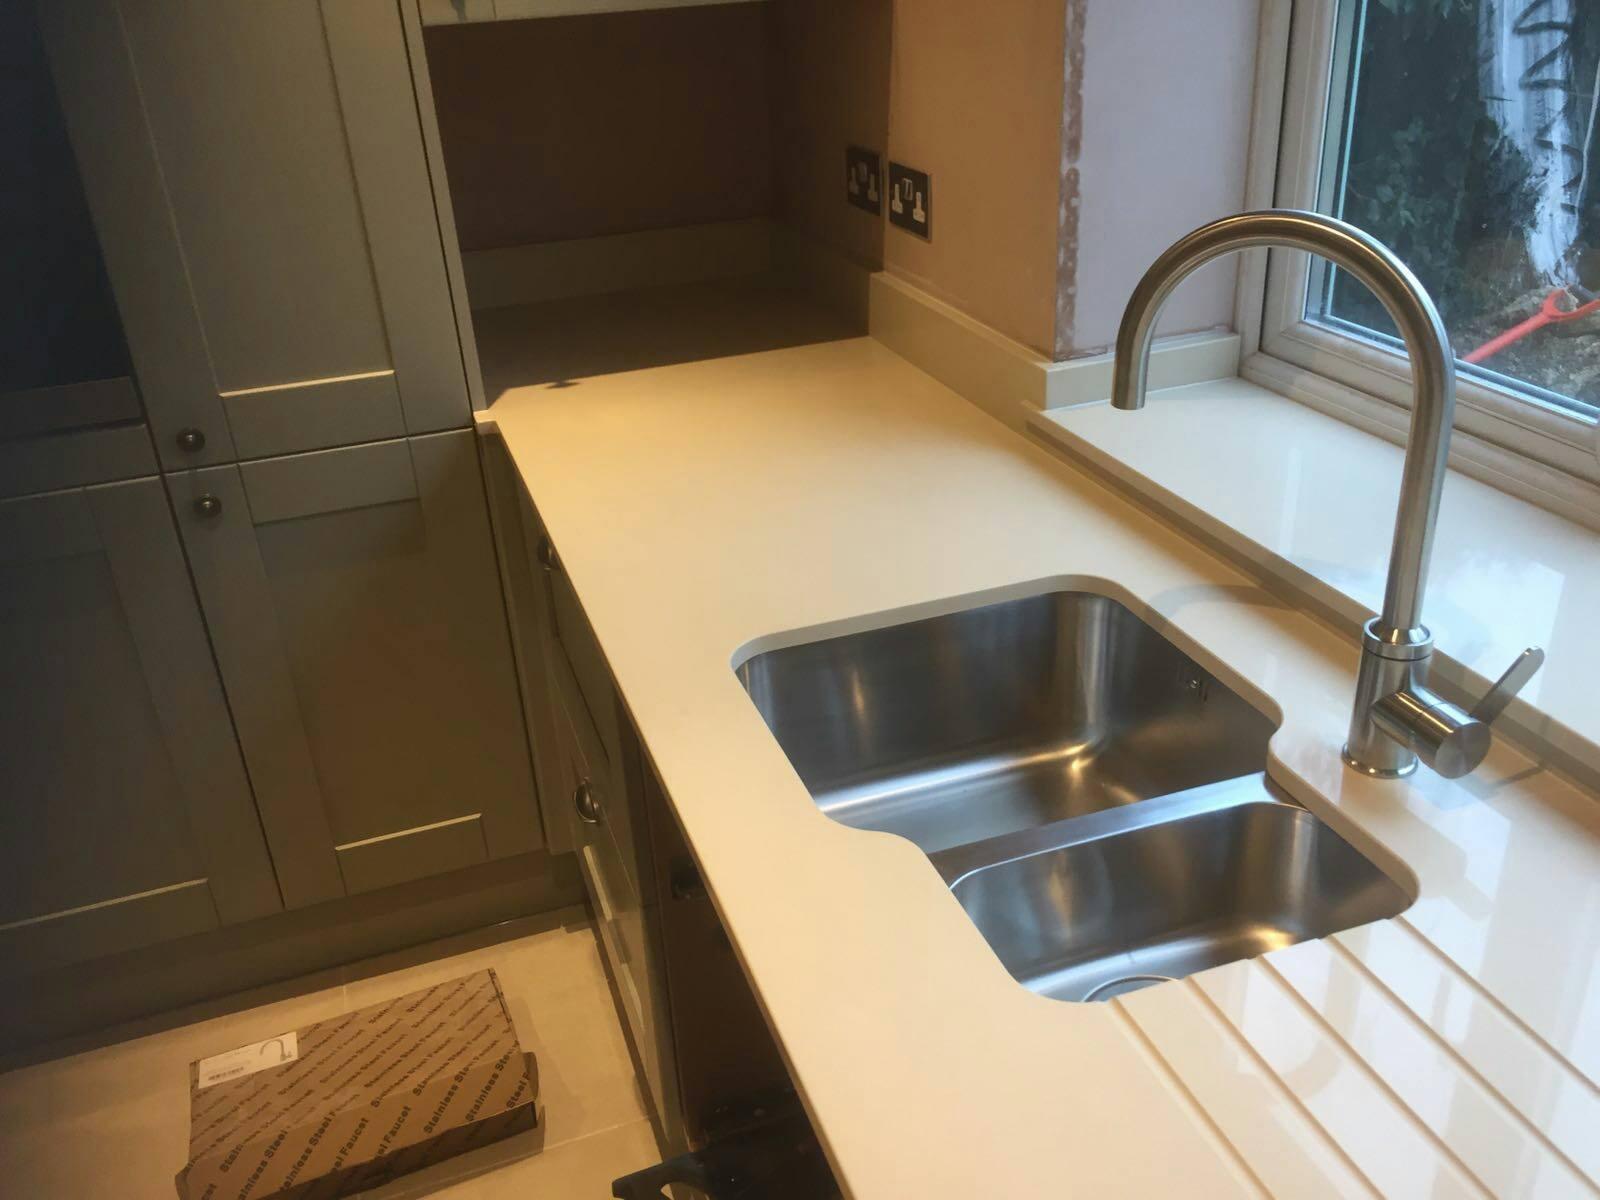 Kitchen sink with matching black glass tap landing and sliding cover - Bianco Marmo Suprema Urban Quartz Kitchen Worktops